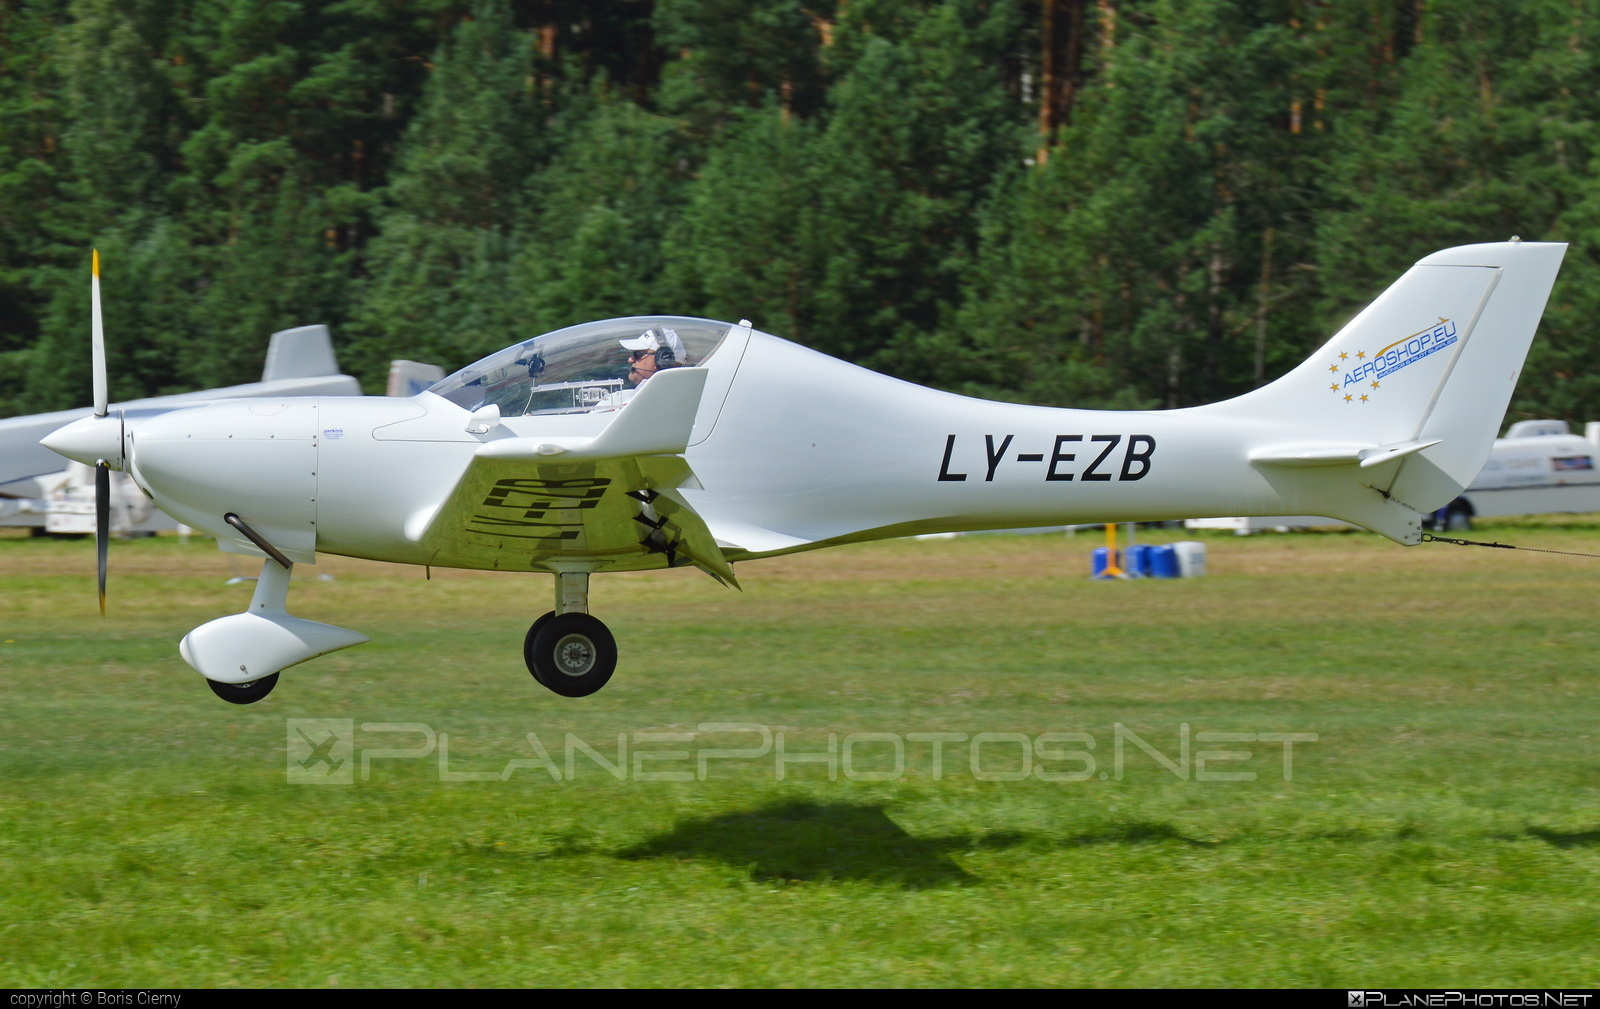 Aerospool WT9 Dynamic - LY-EZB operated by Private operator #aerospool #wt9 #wt9dynamic